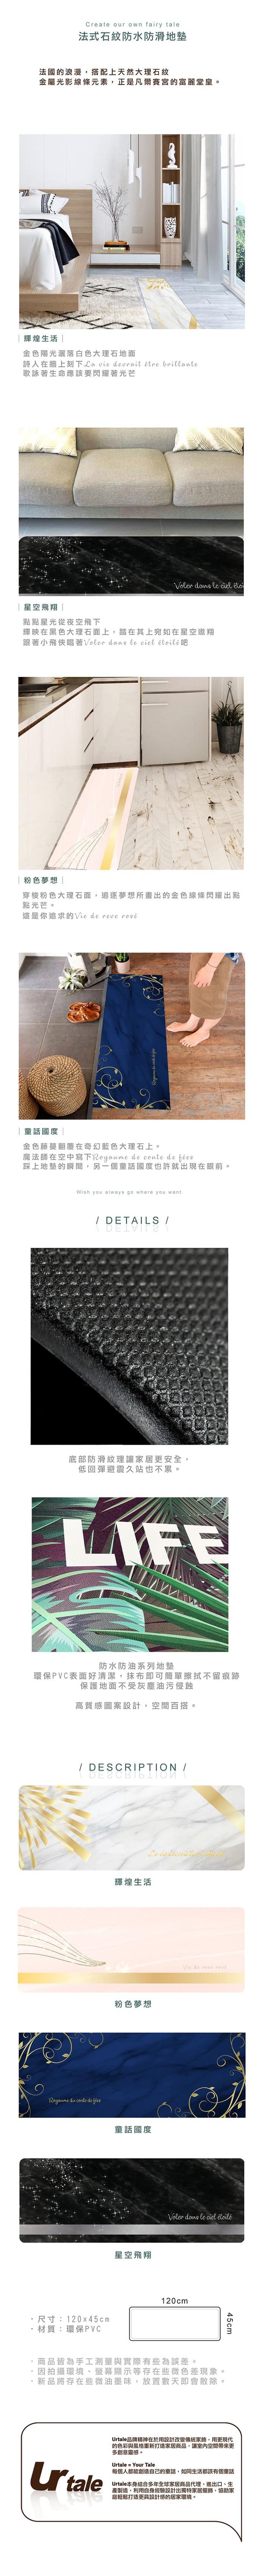 Urtale 法式石紋防水防滑踏墊